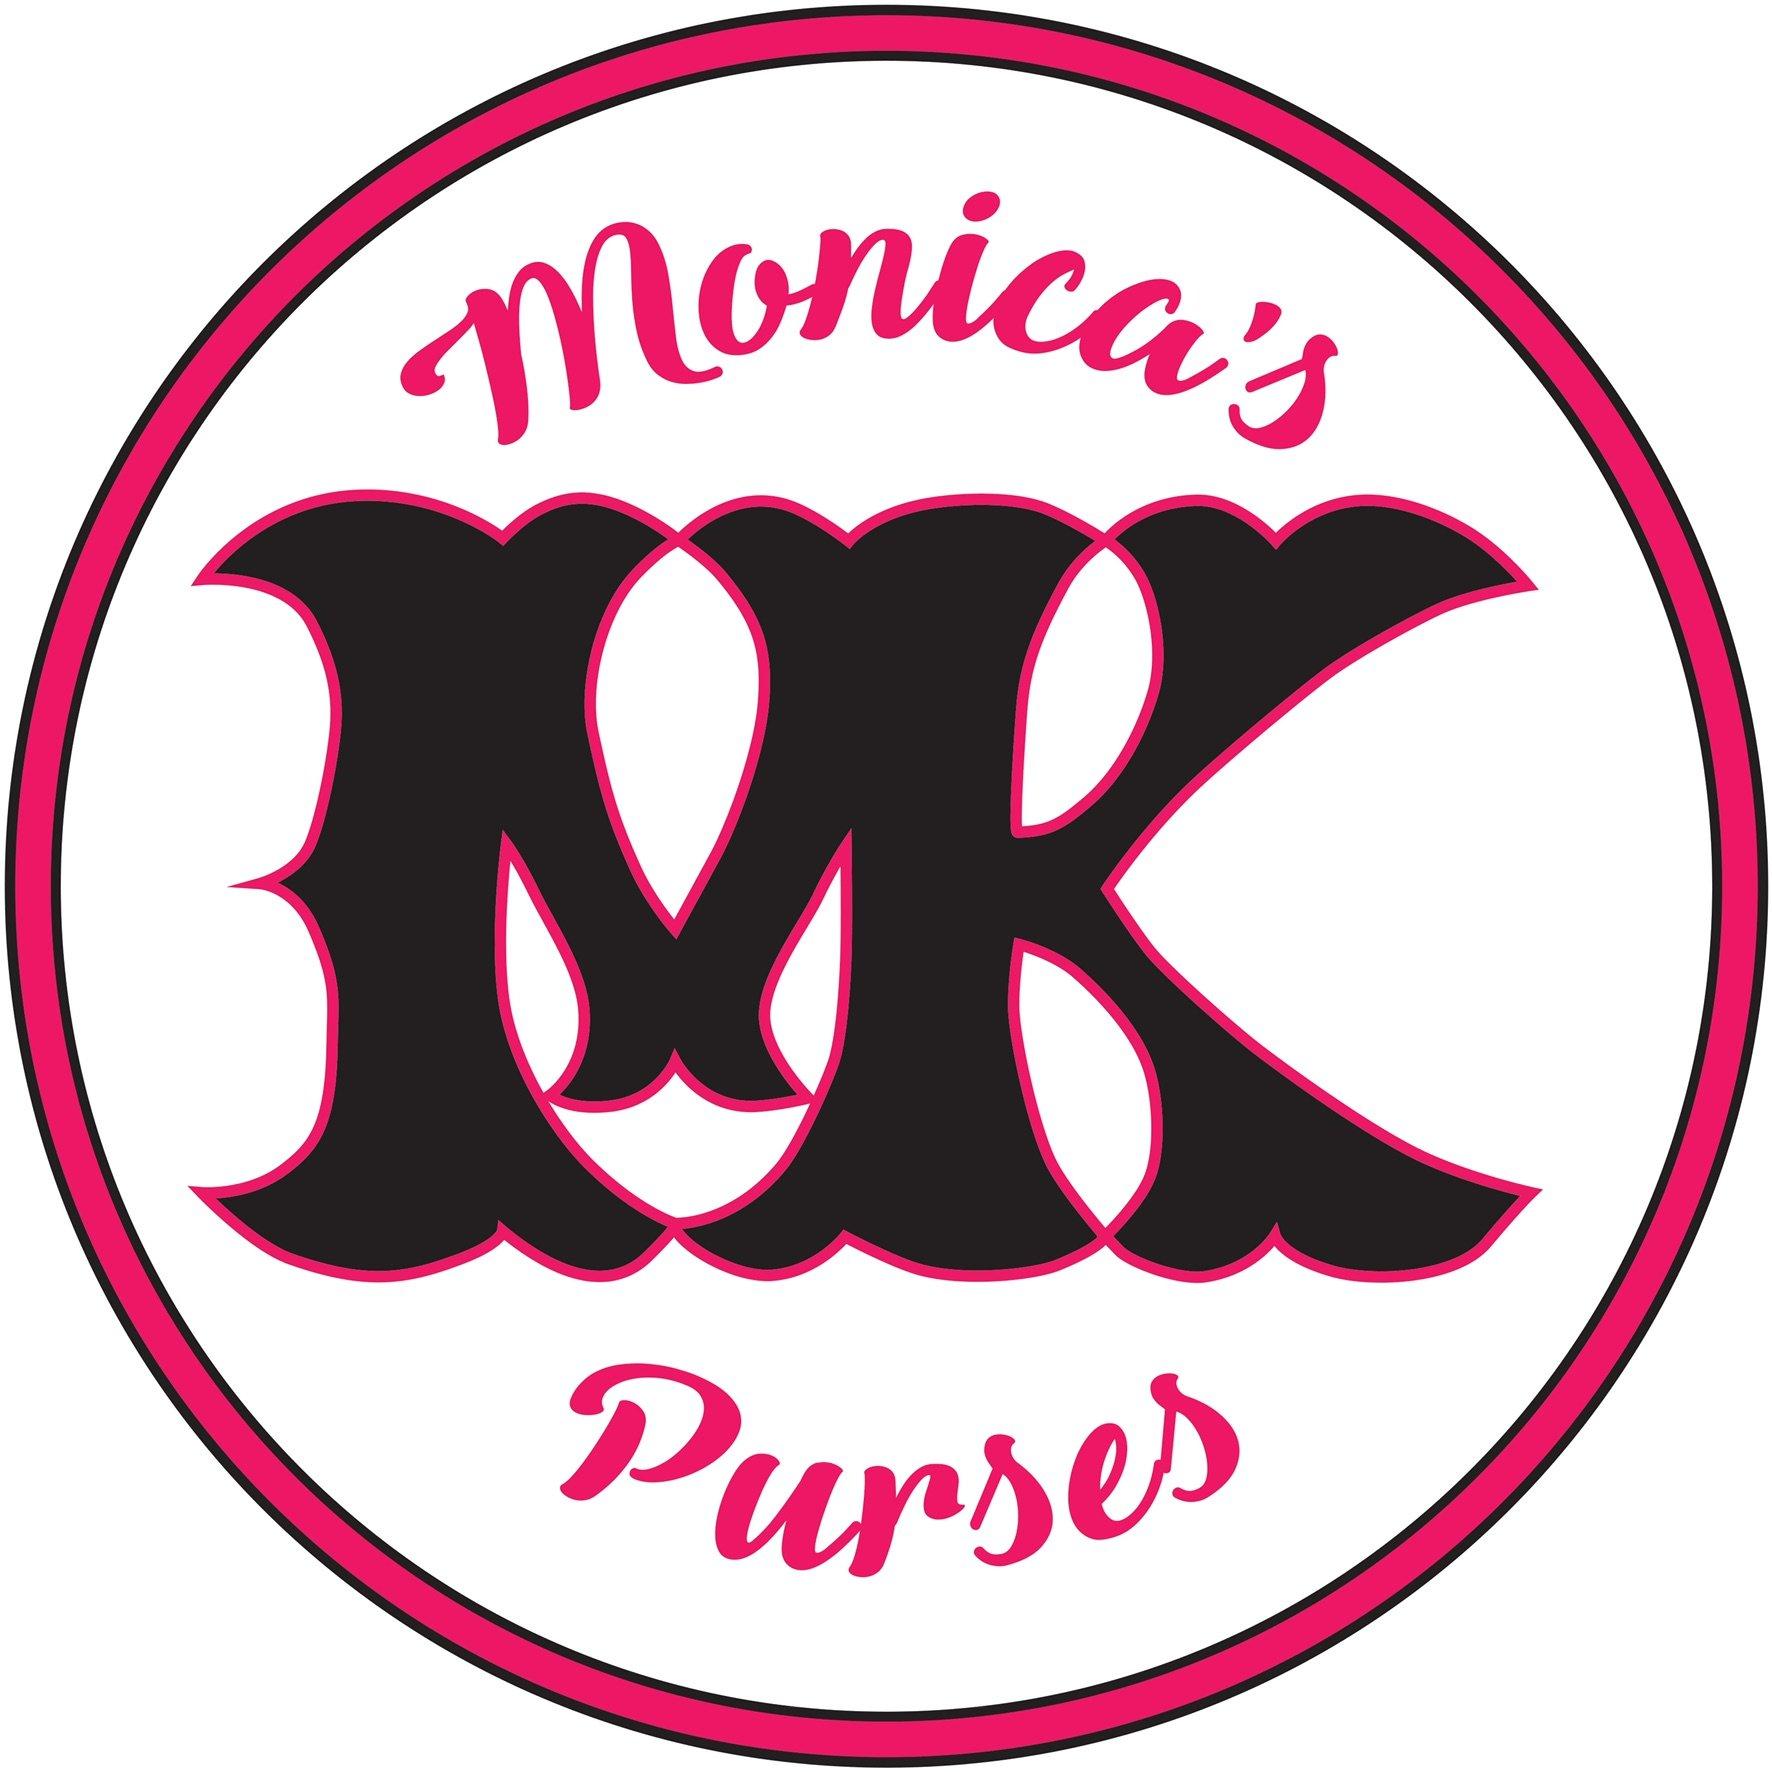 0a73adbb41a9 Monica's MK Purses (@monicasmkpurses) | Twitter